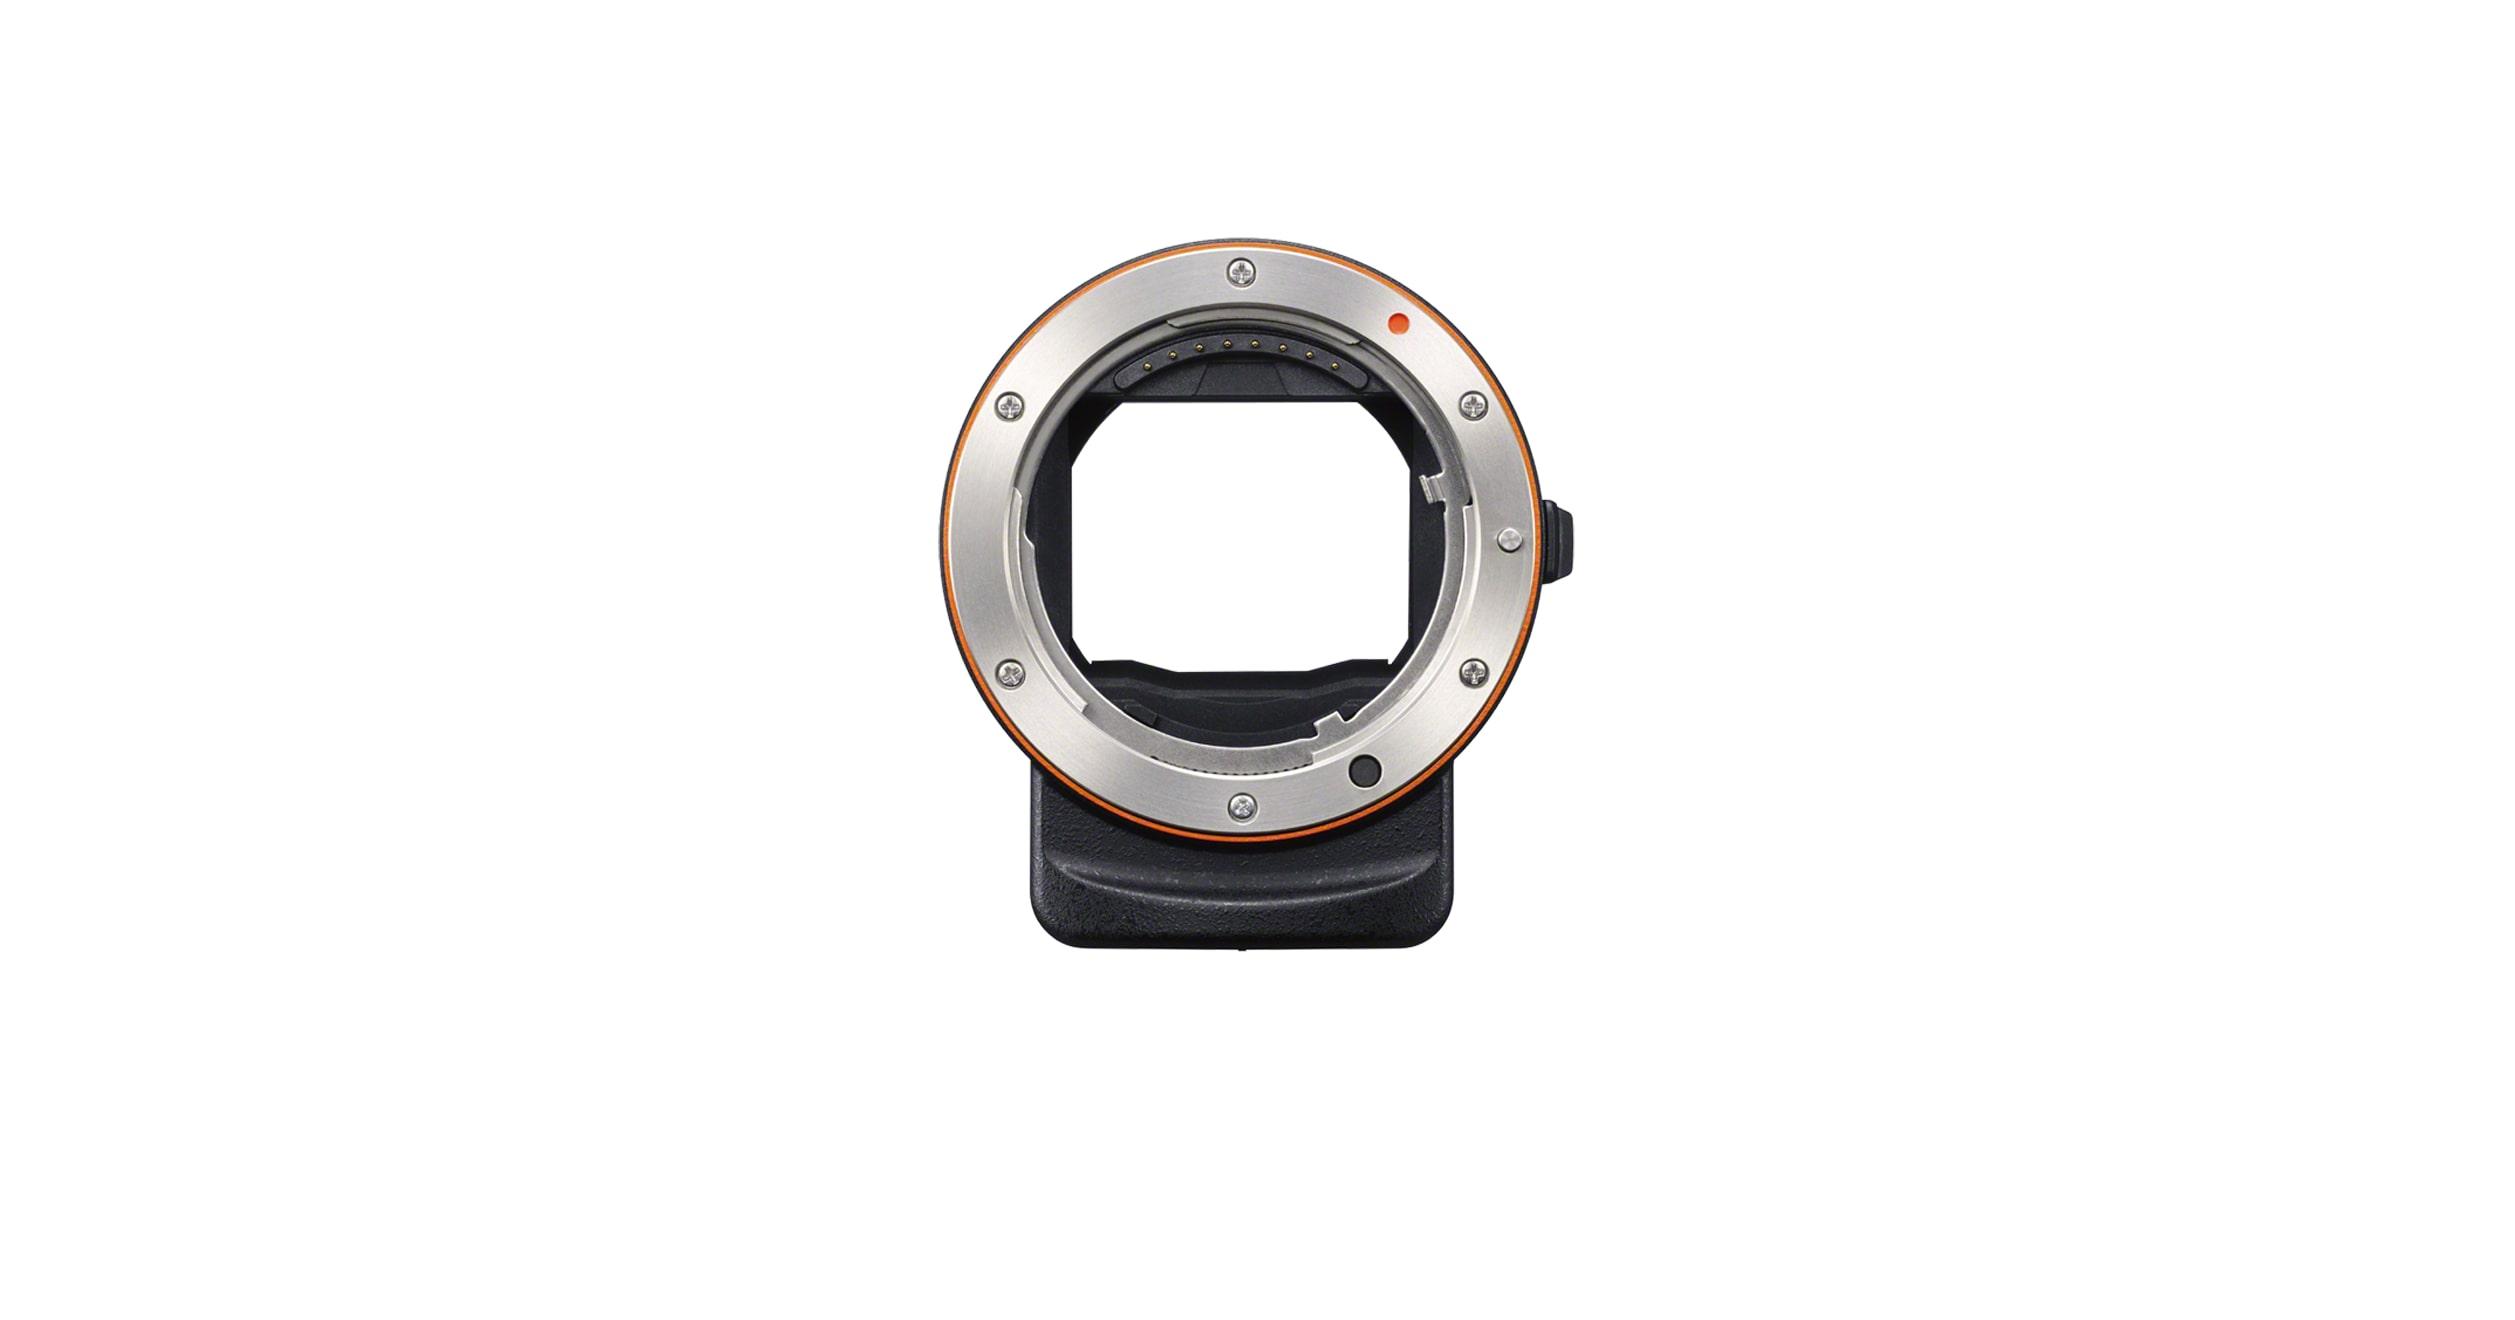 Black//Silver Sony LAEA3 35mm Full Frame A-Mount Adapter